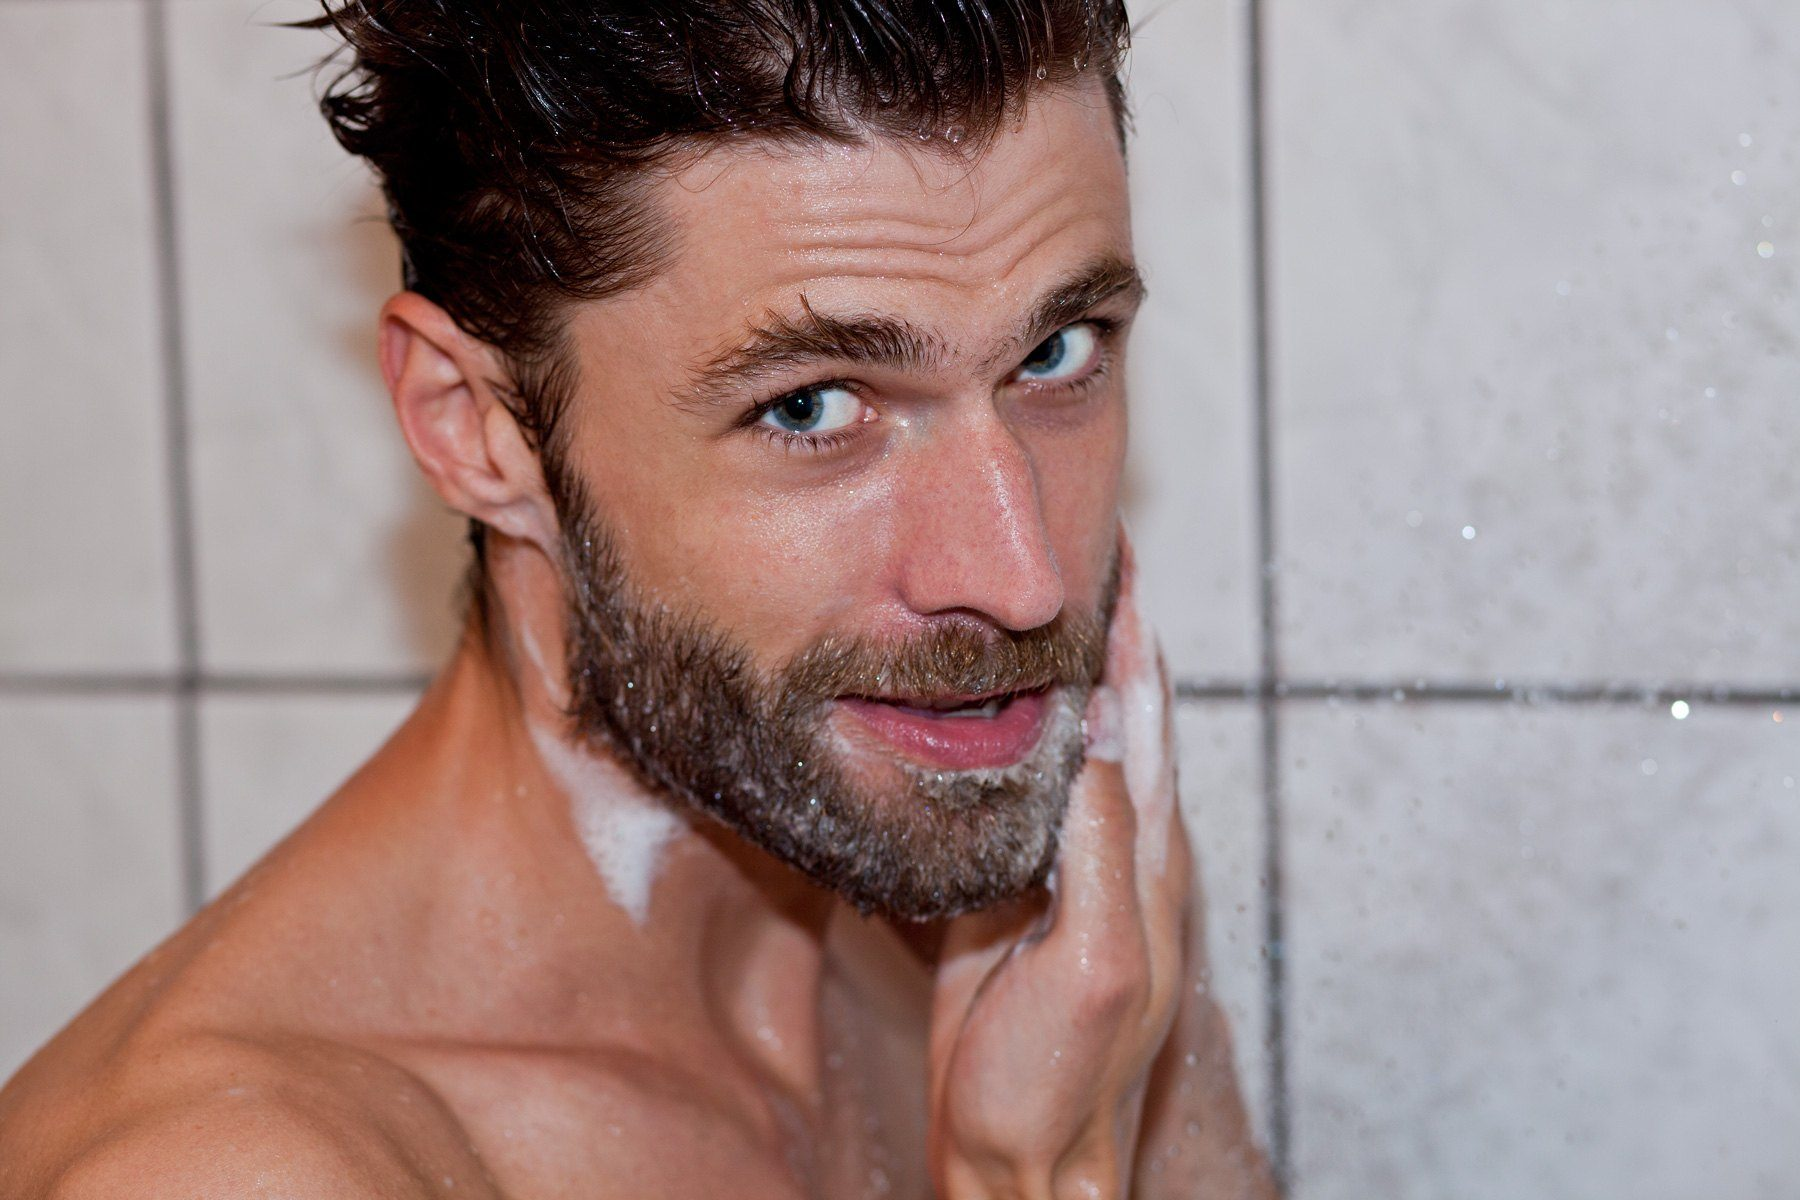 scrub beard and mustache